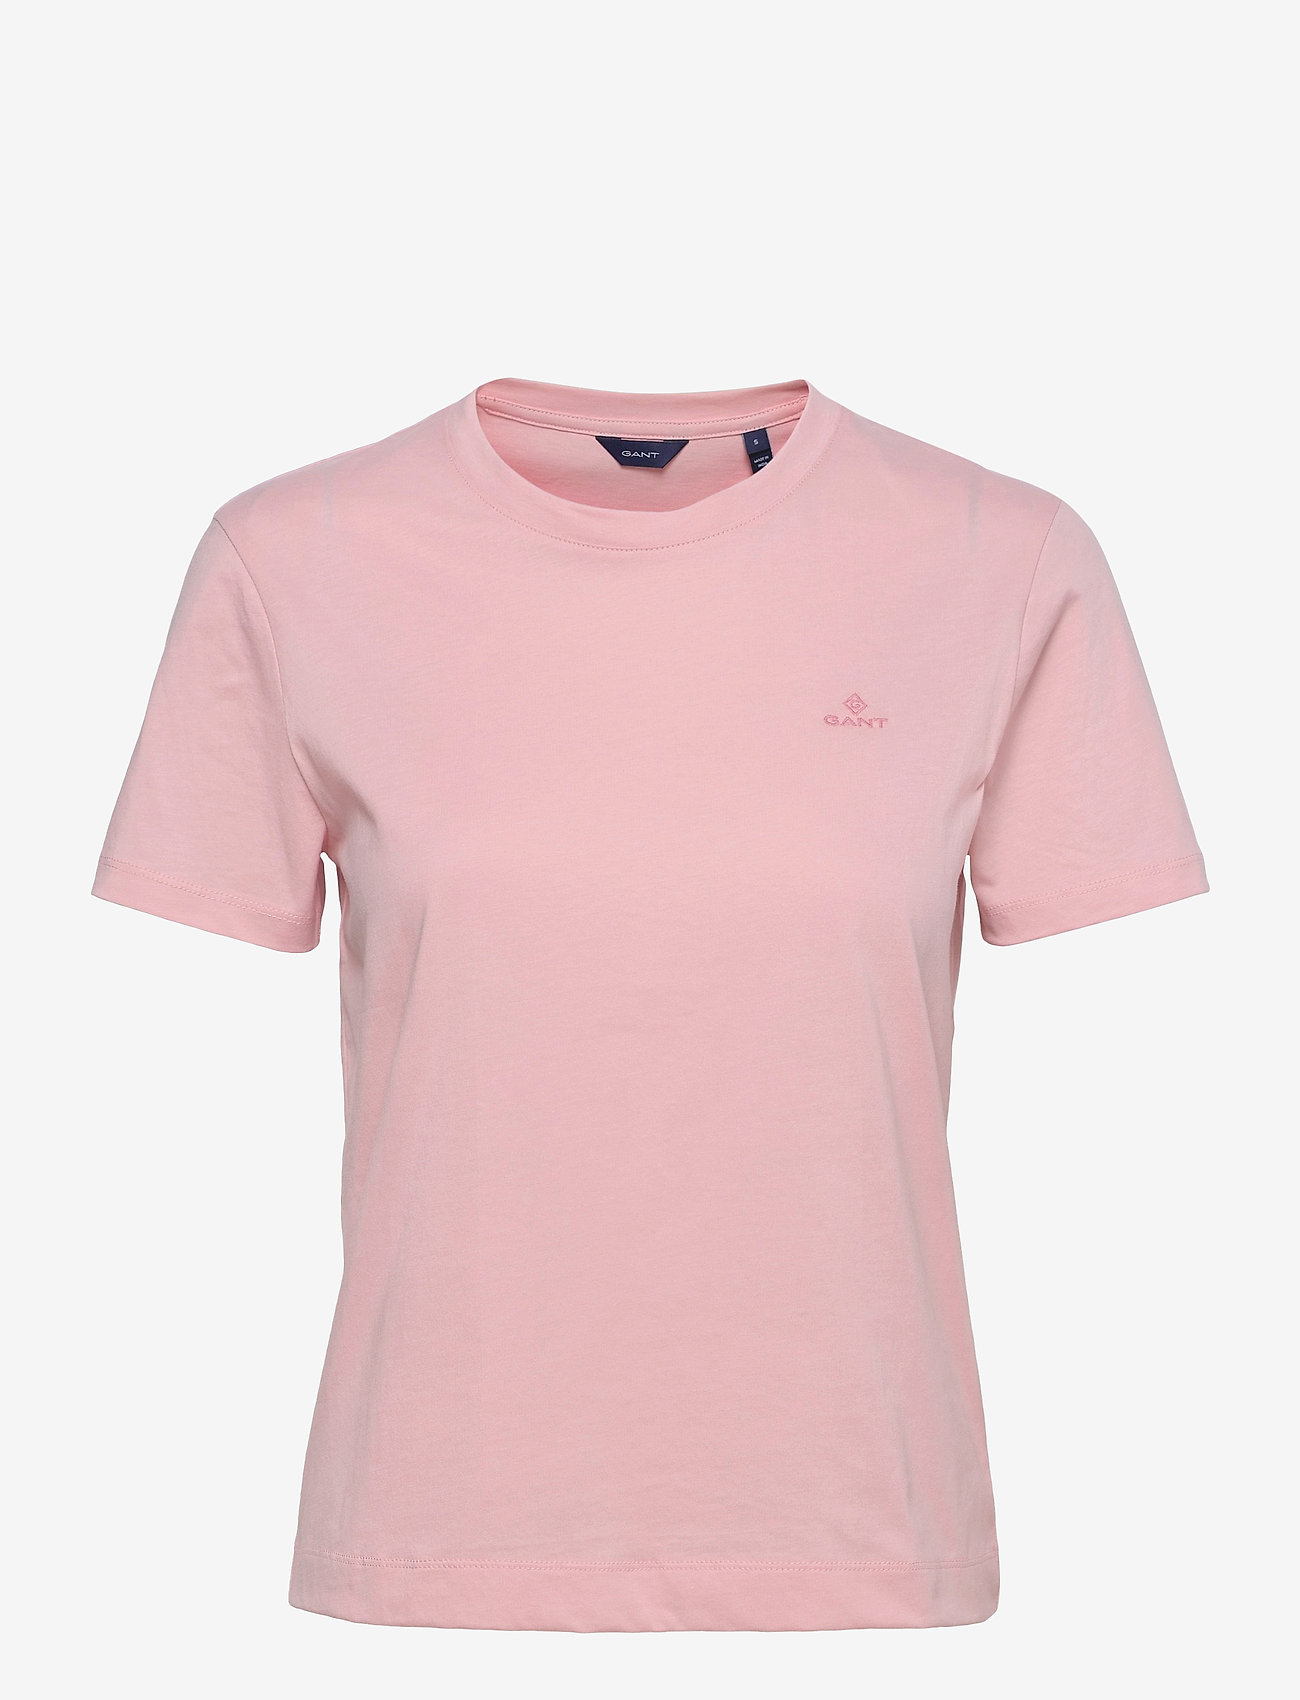 GANT - ORIGINAL SS T-SHIRT - t-shirts - preppy pink - 0